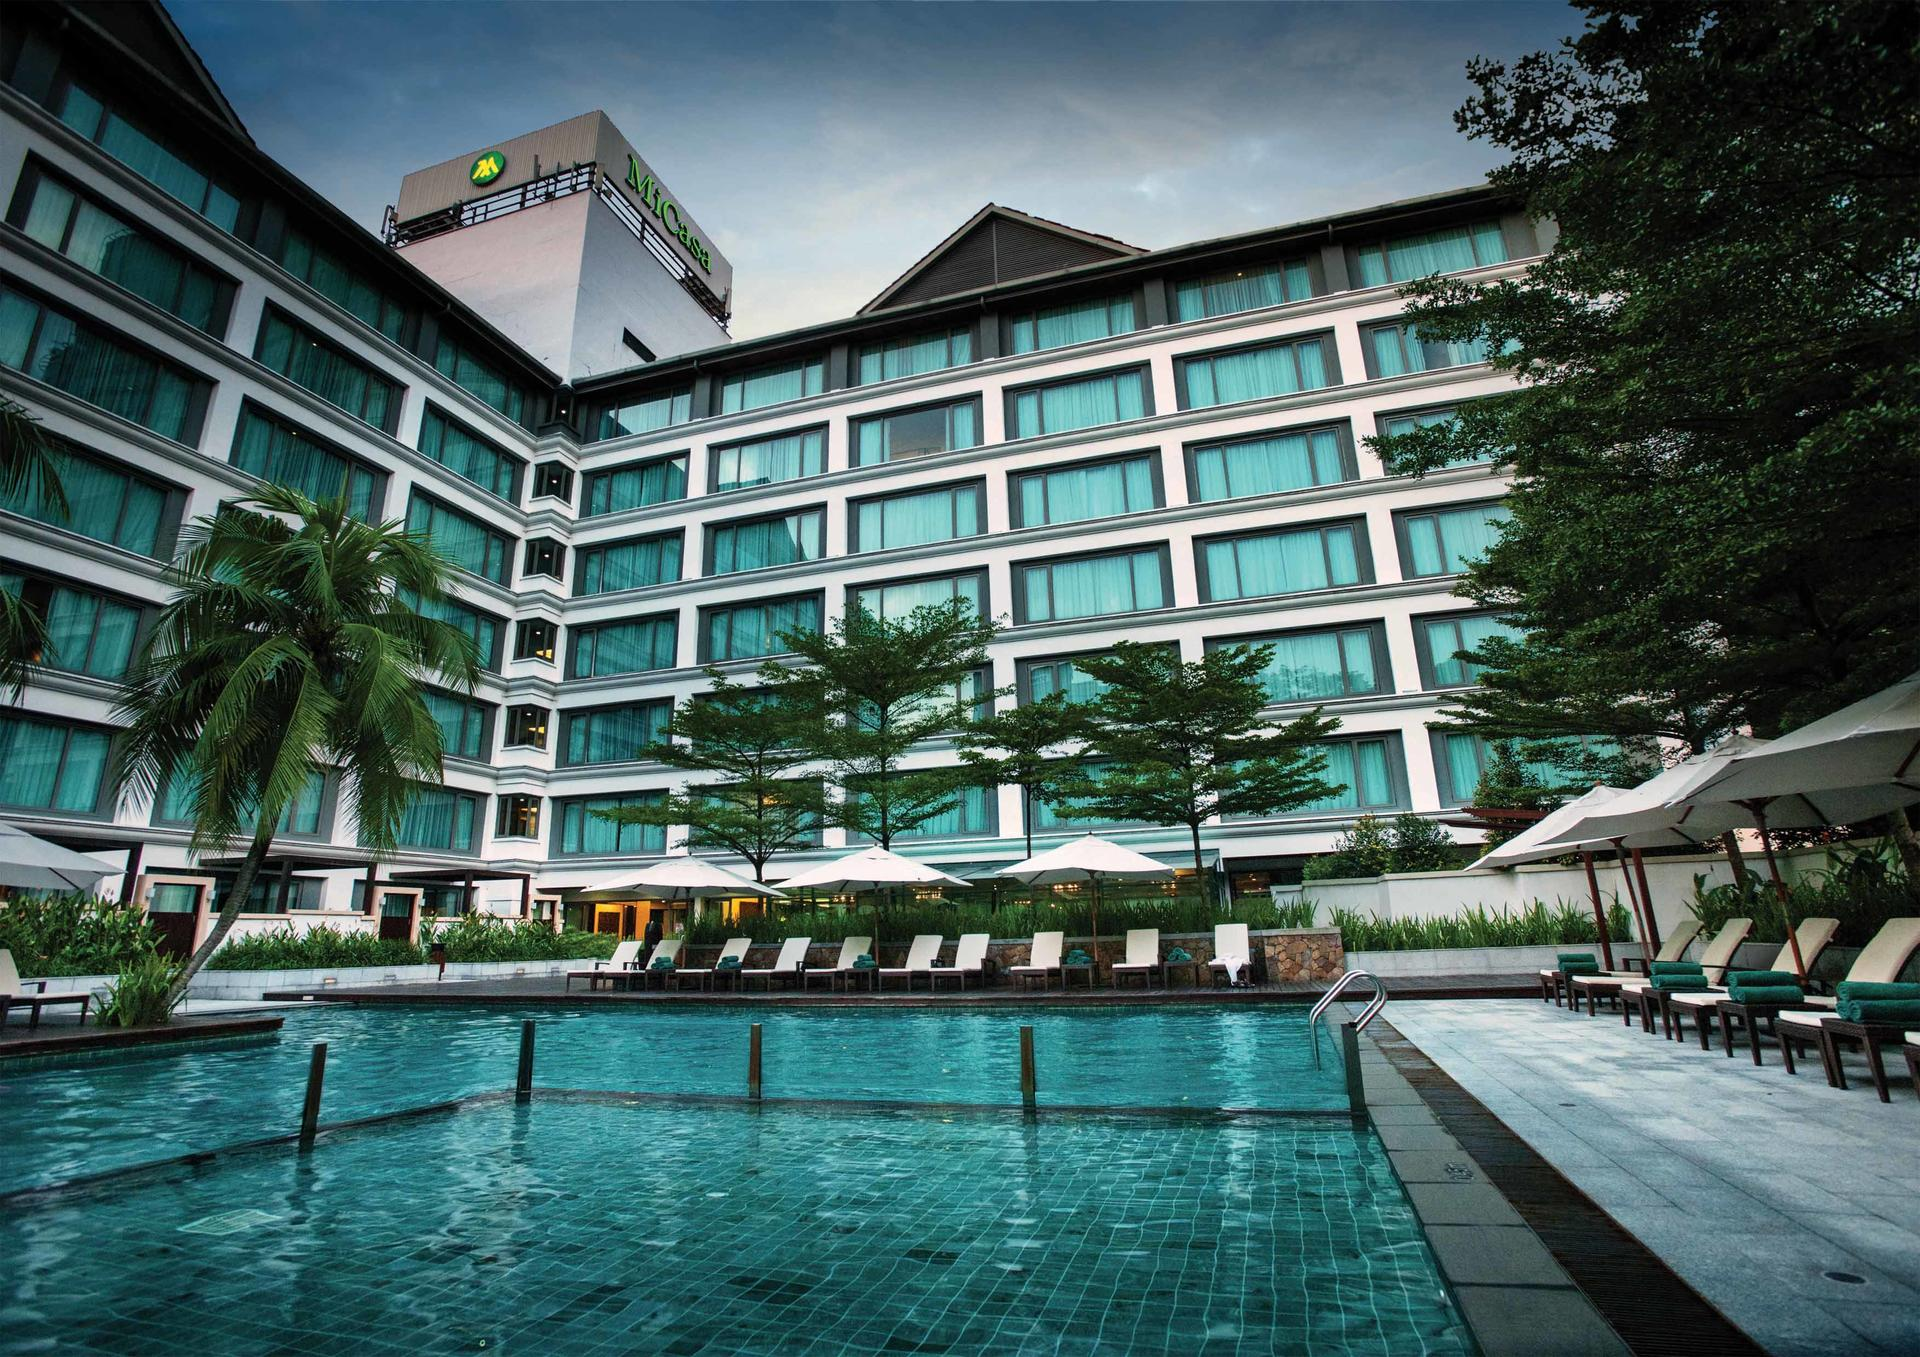 Hotel in KLCC Kuala Lumpur | MiCasa All Suite Hotel Kuala Lumpur